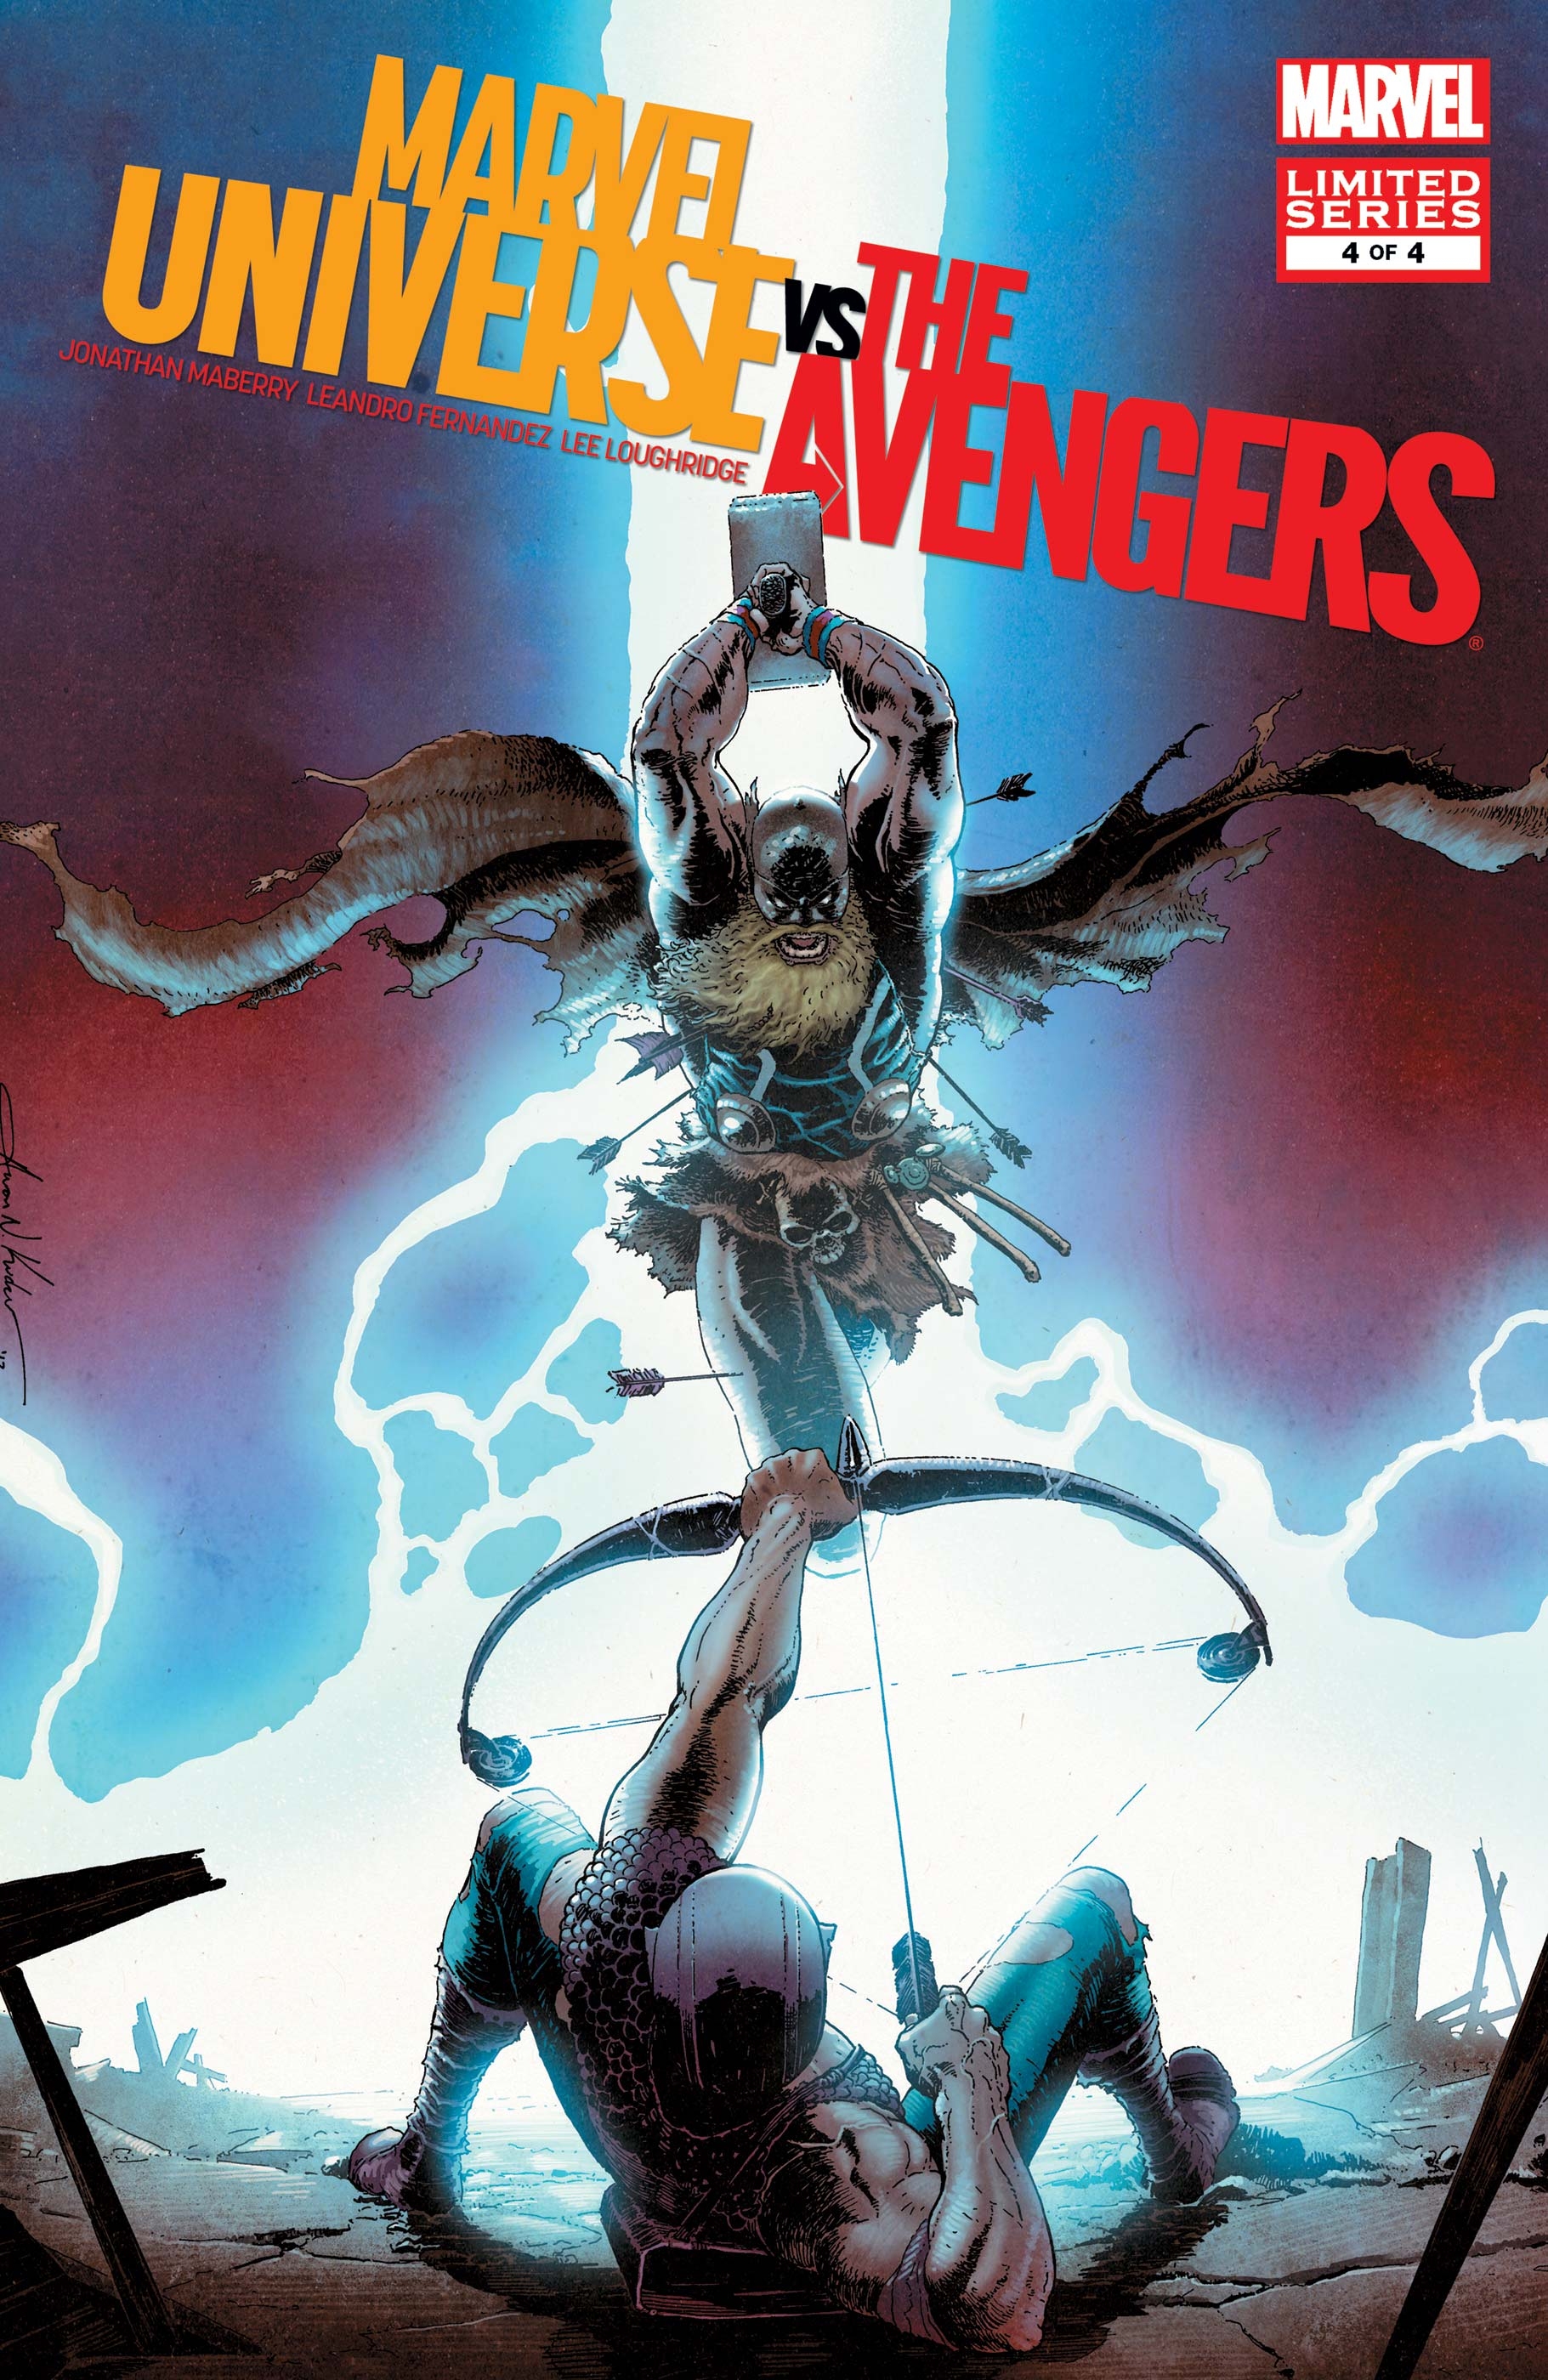 Marvel Universe vs. The Avengers (2012) #4